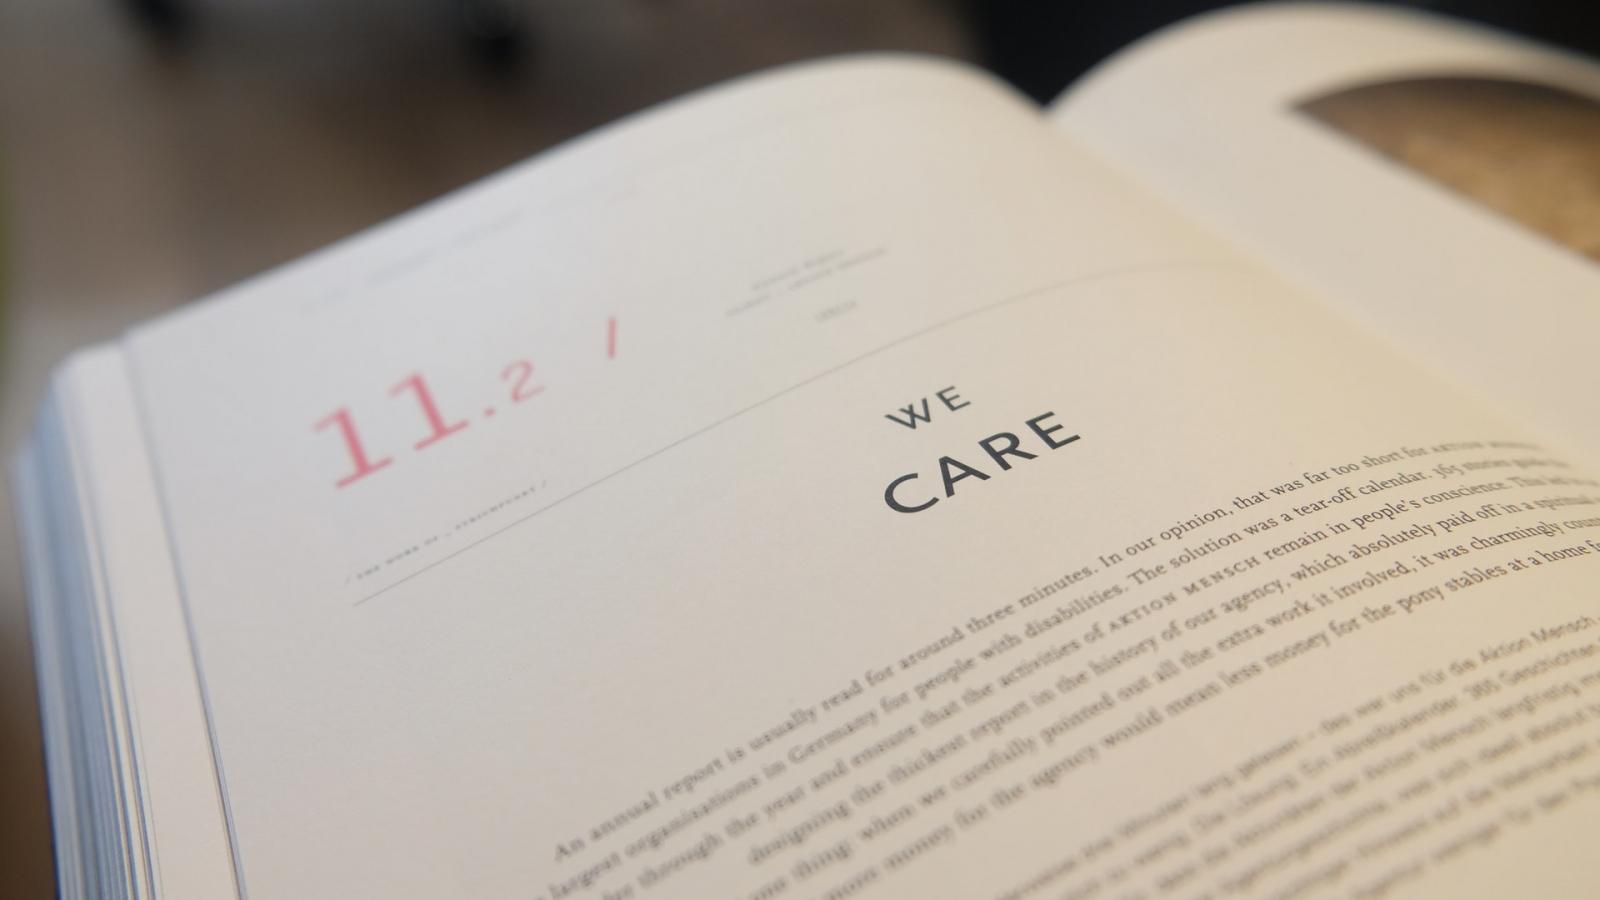 mortgage loan process - we care